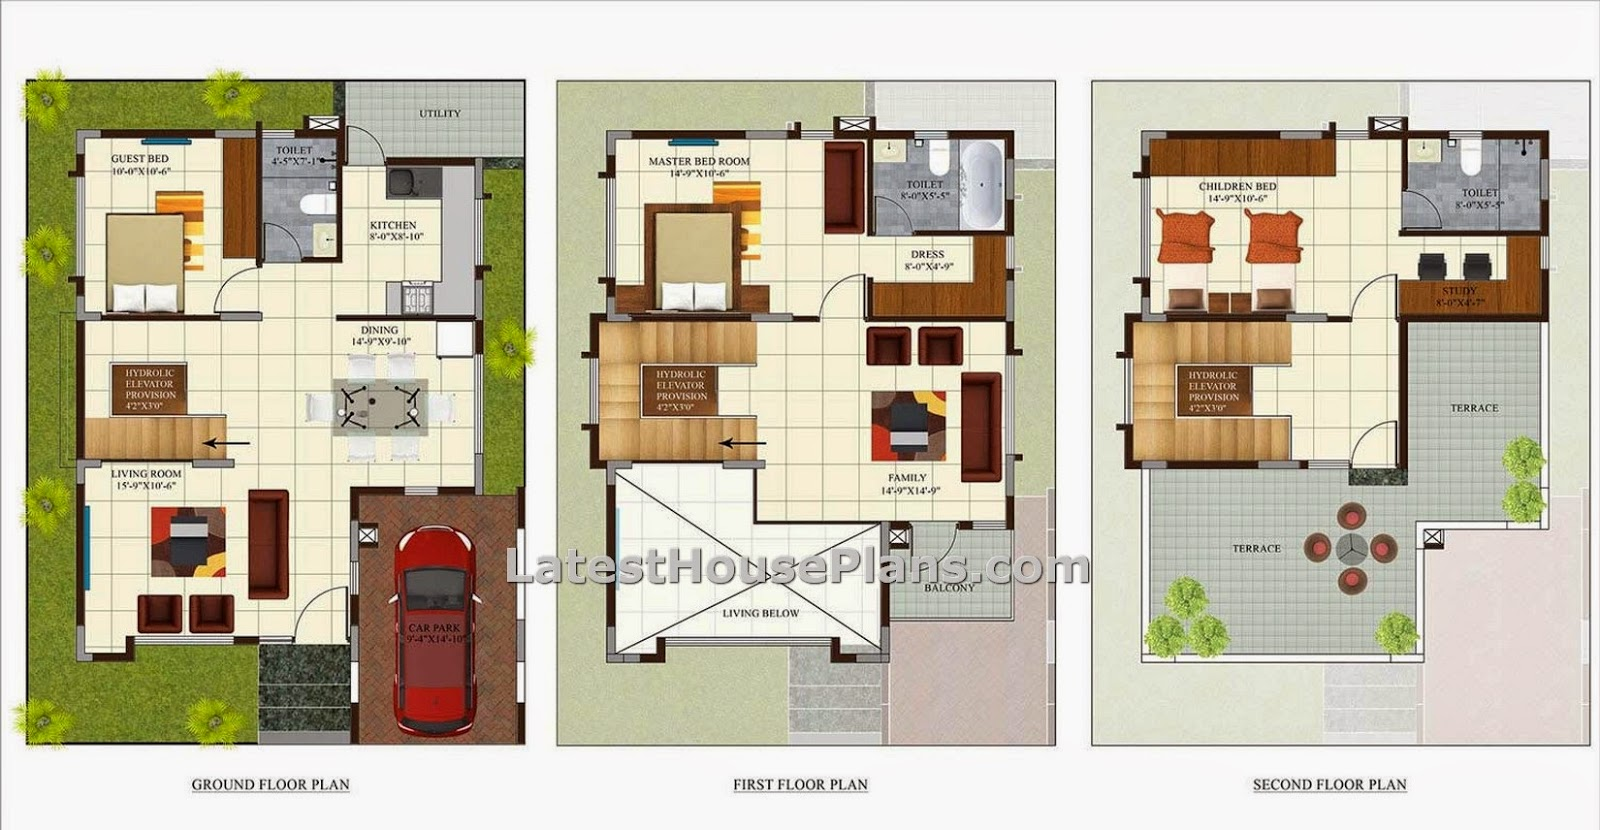 bedroom luxury villa house plan area sq ft latest bedroom apartment house plans